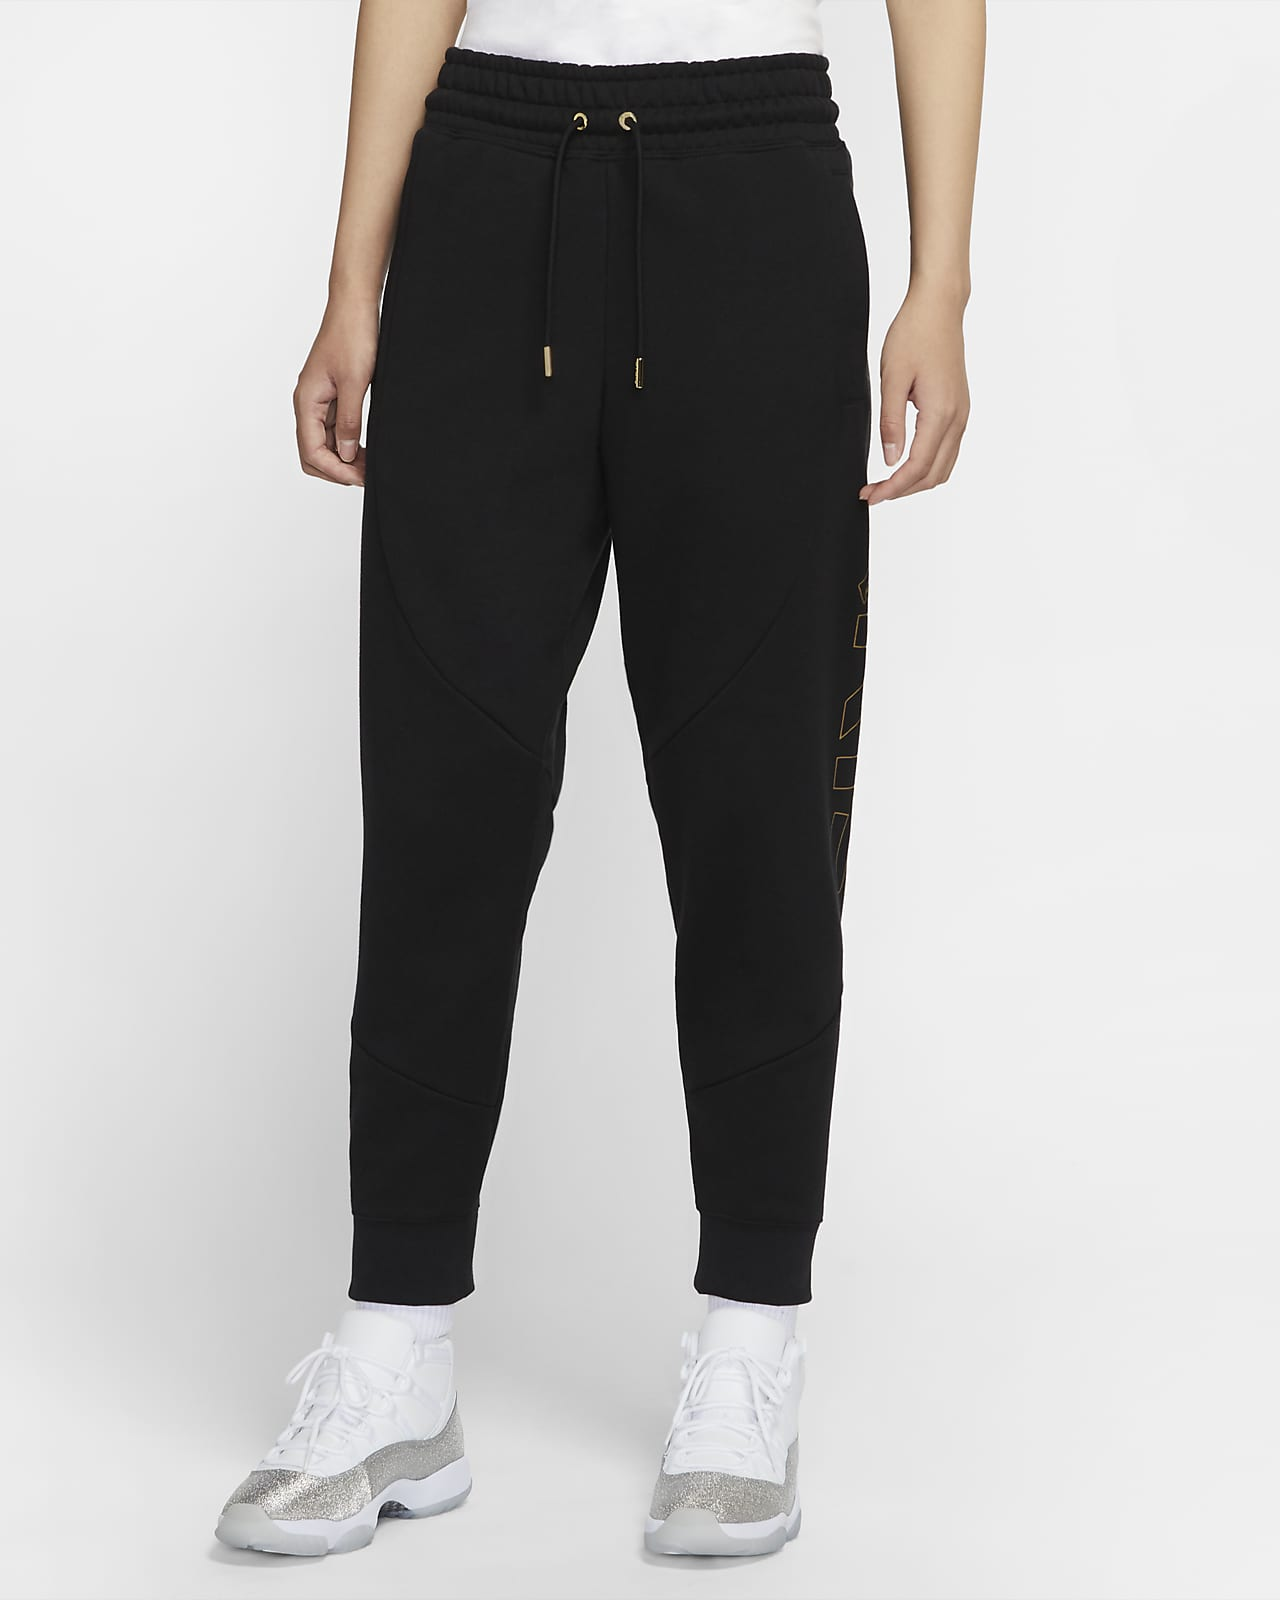 Pantaloni in fleece Paris Saint-Germain - Donna